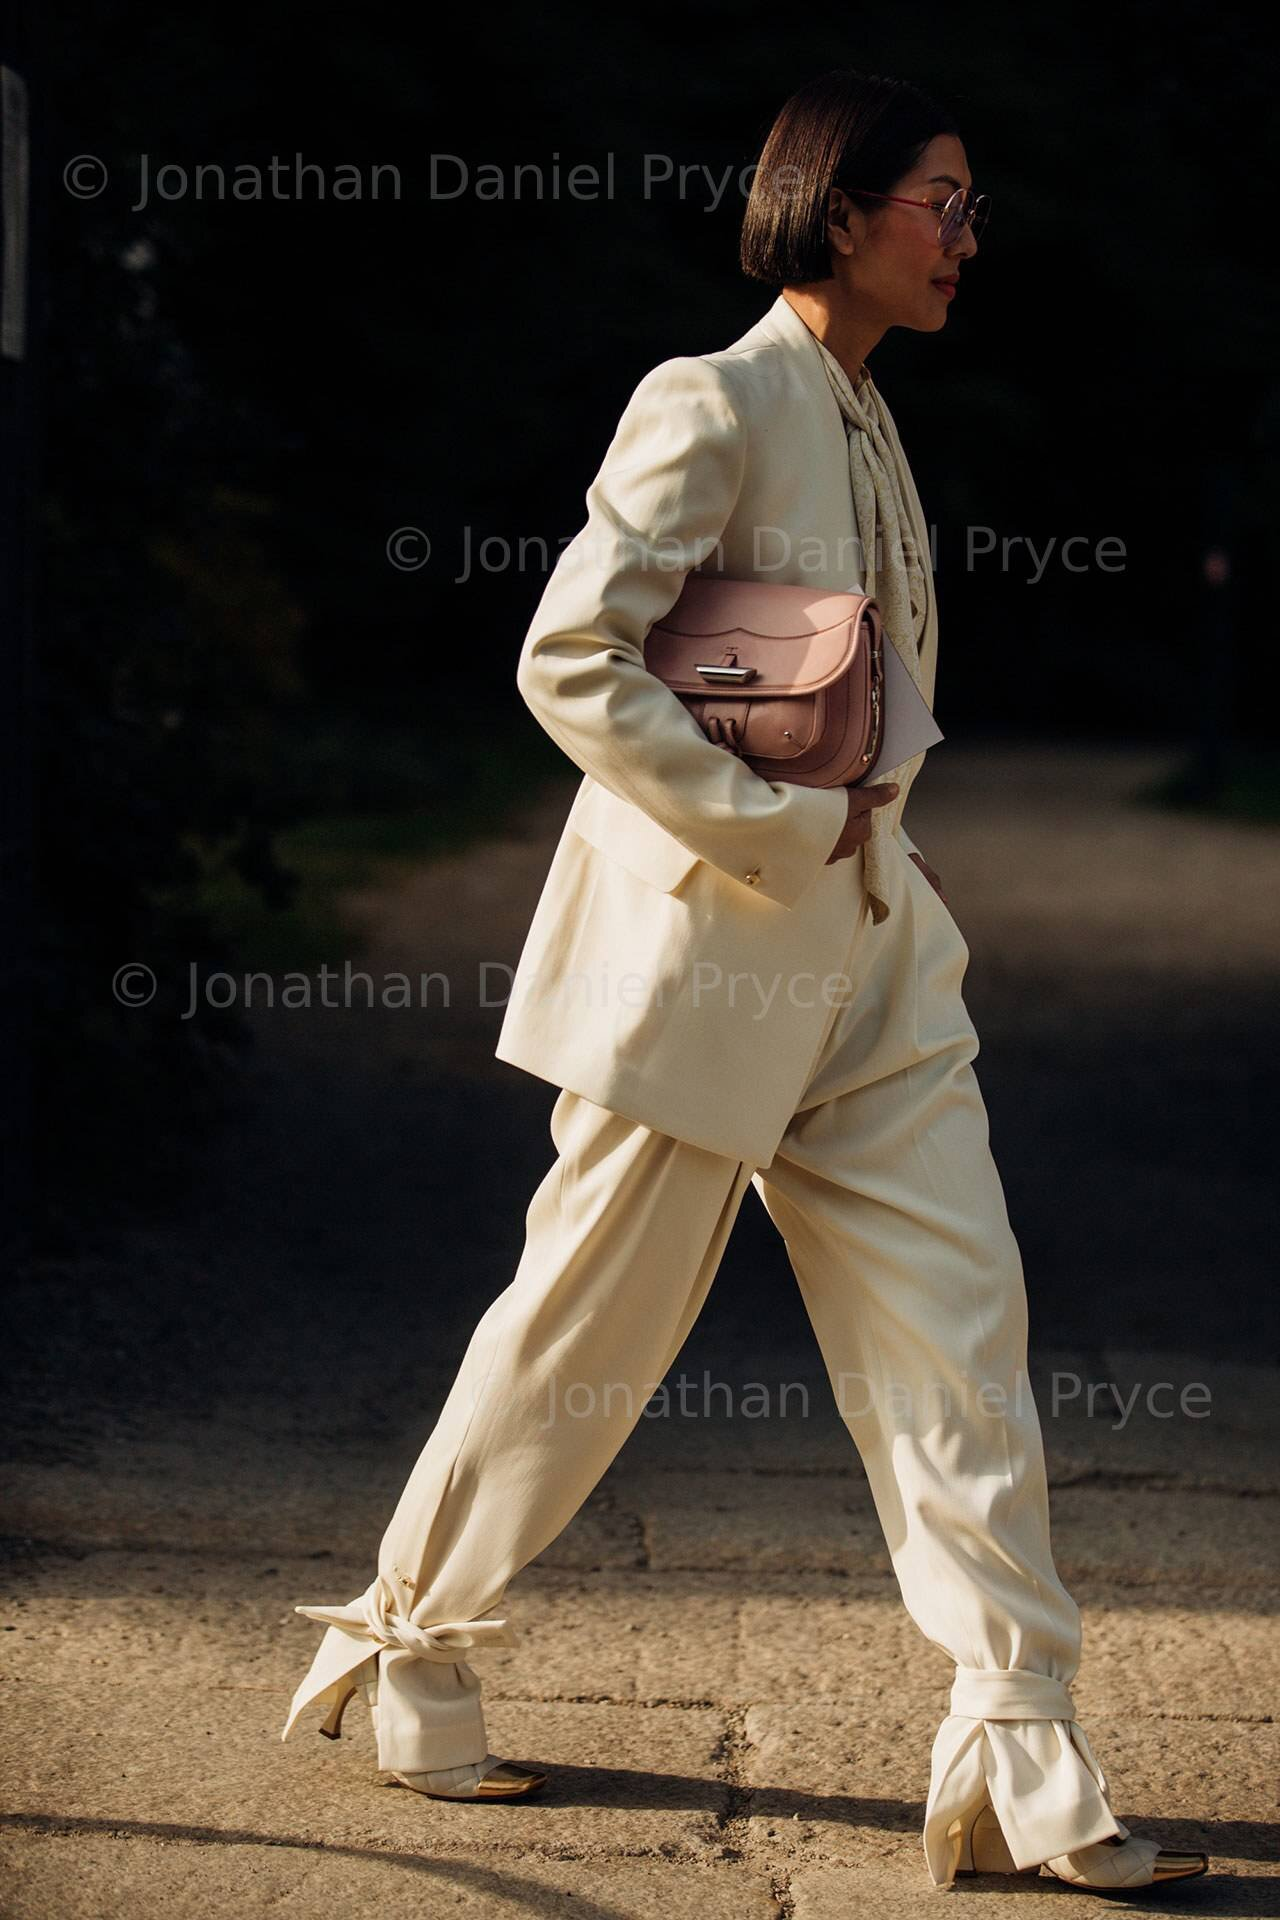 001-Ankle-Ties-Vogueint_Oct8-credit_Jonathan-Daniel-Pryce.jpg